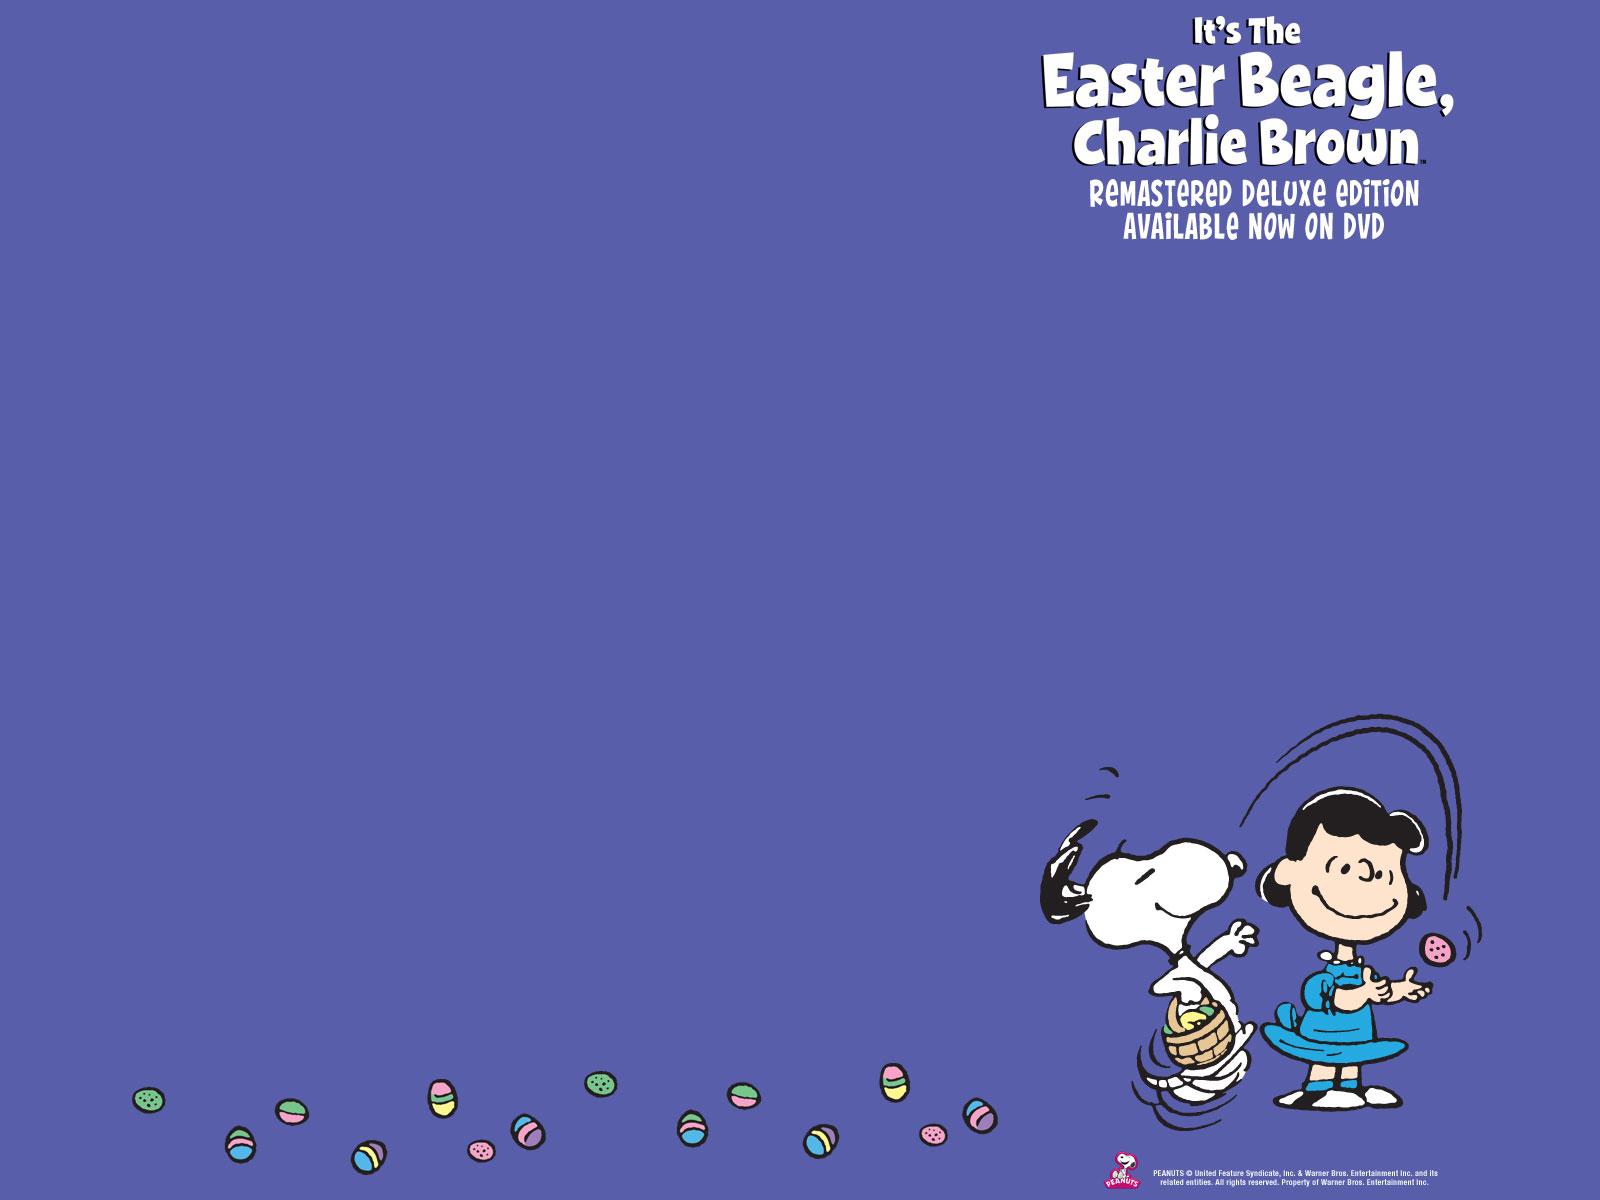 download Charlie Brown Easter Charlie brown desktop 1600x1200